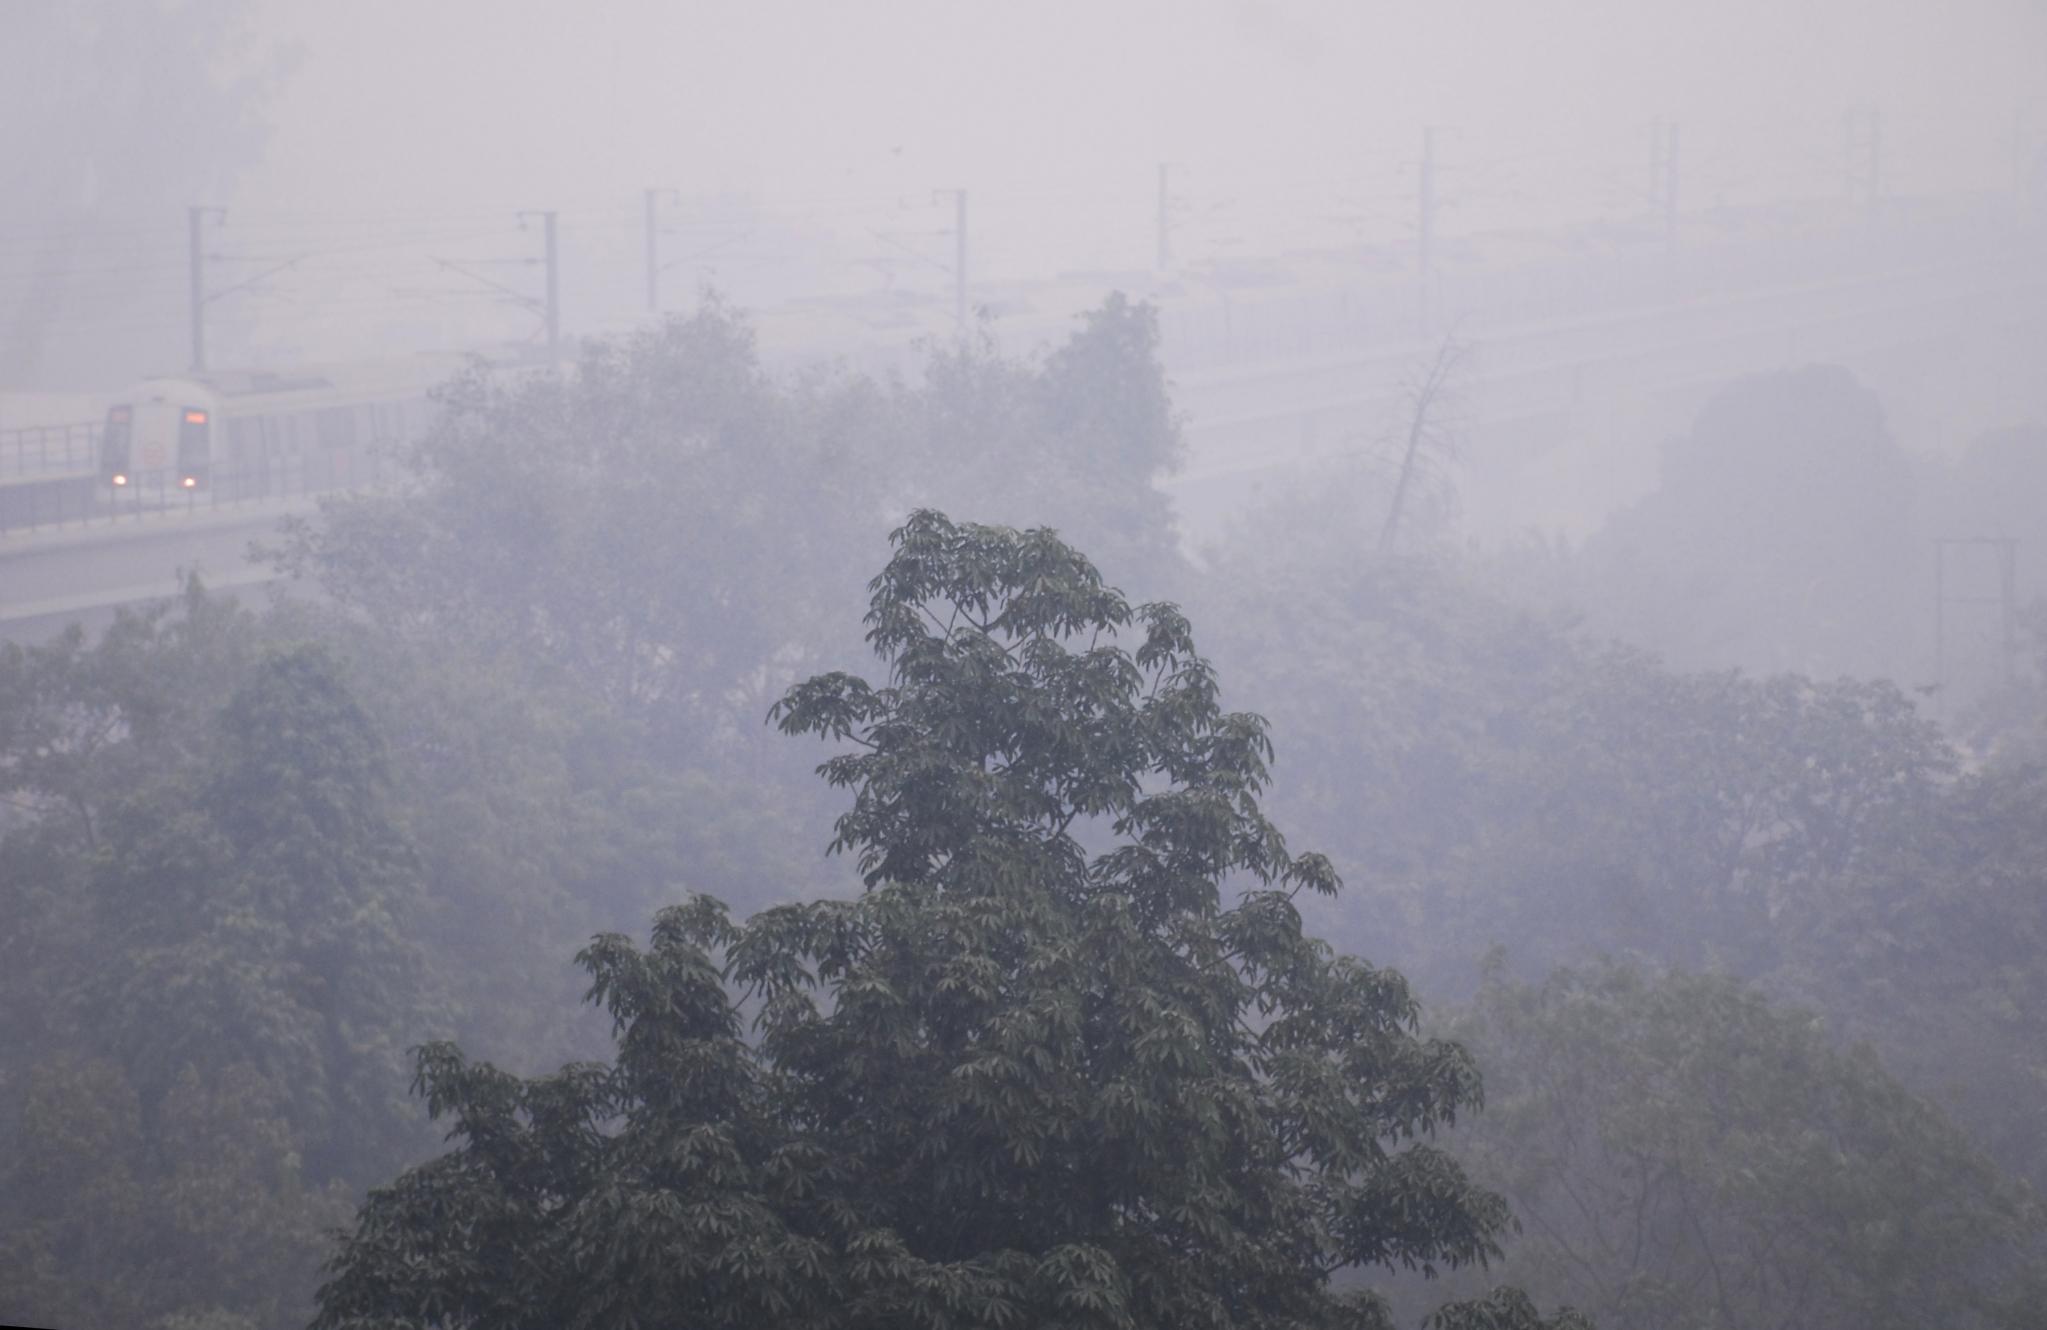 धुआं-धुआं दिल्ली-एनसीआर, जानलेवा स्तर पर पहुंचा प्रदूषण